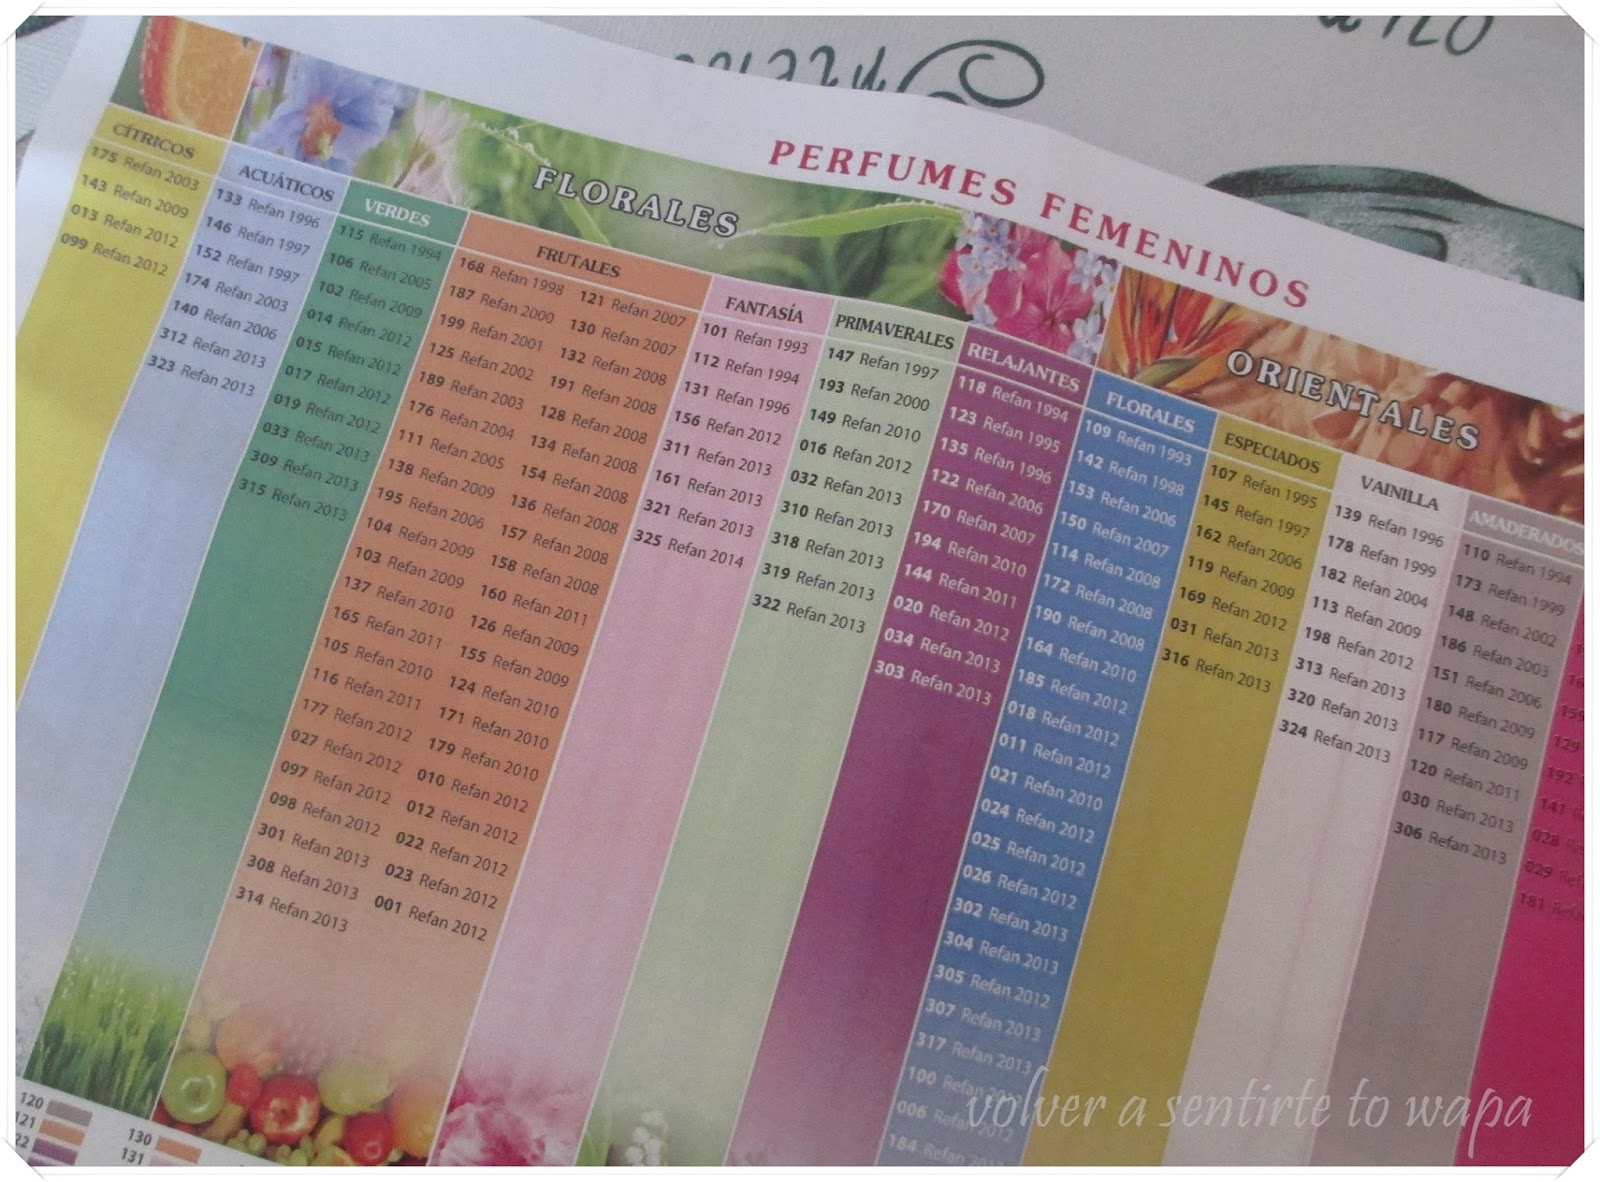 REFAN - Tabla olfativa de perfumes femeninos